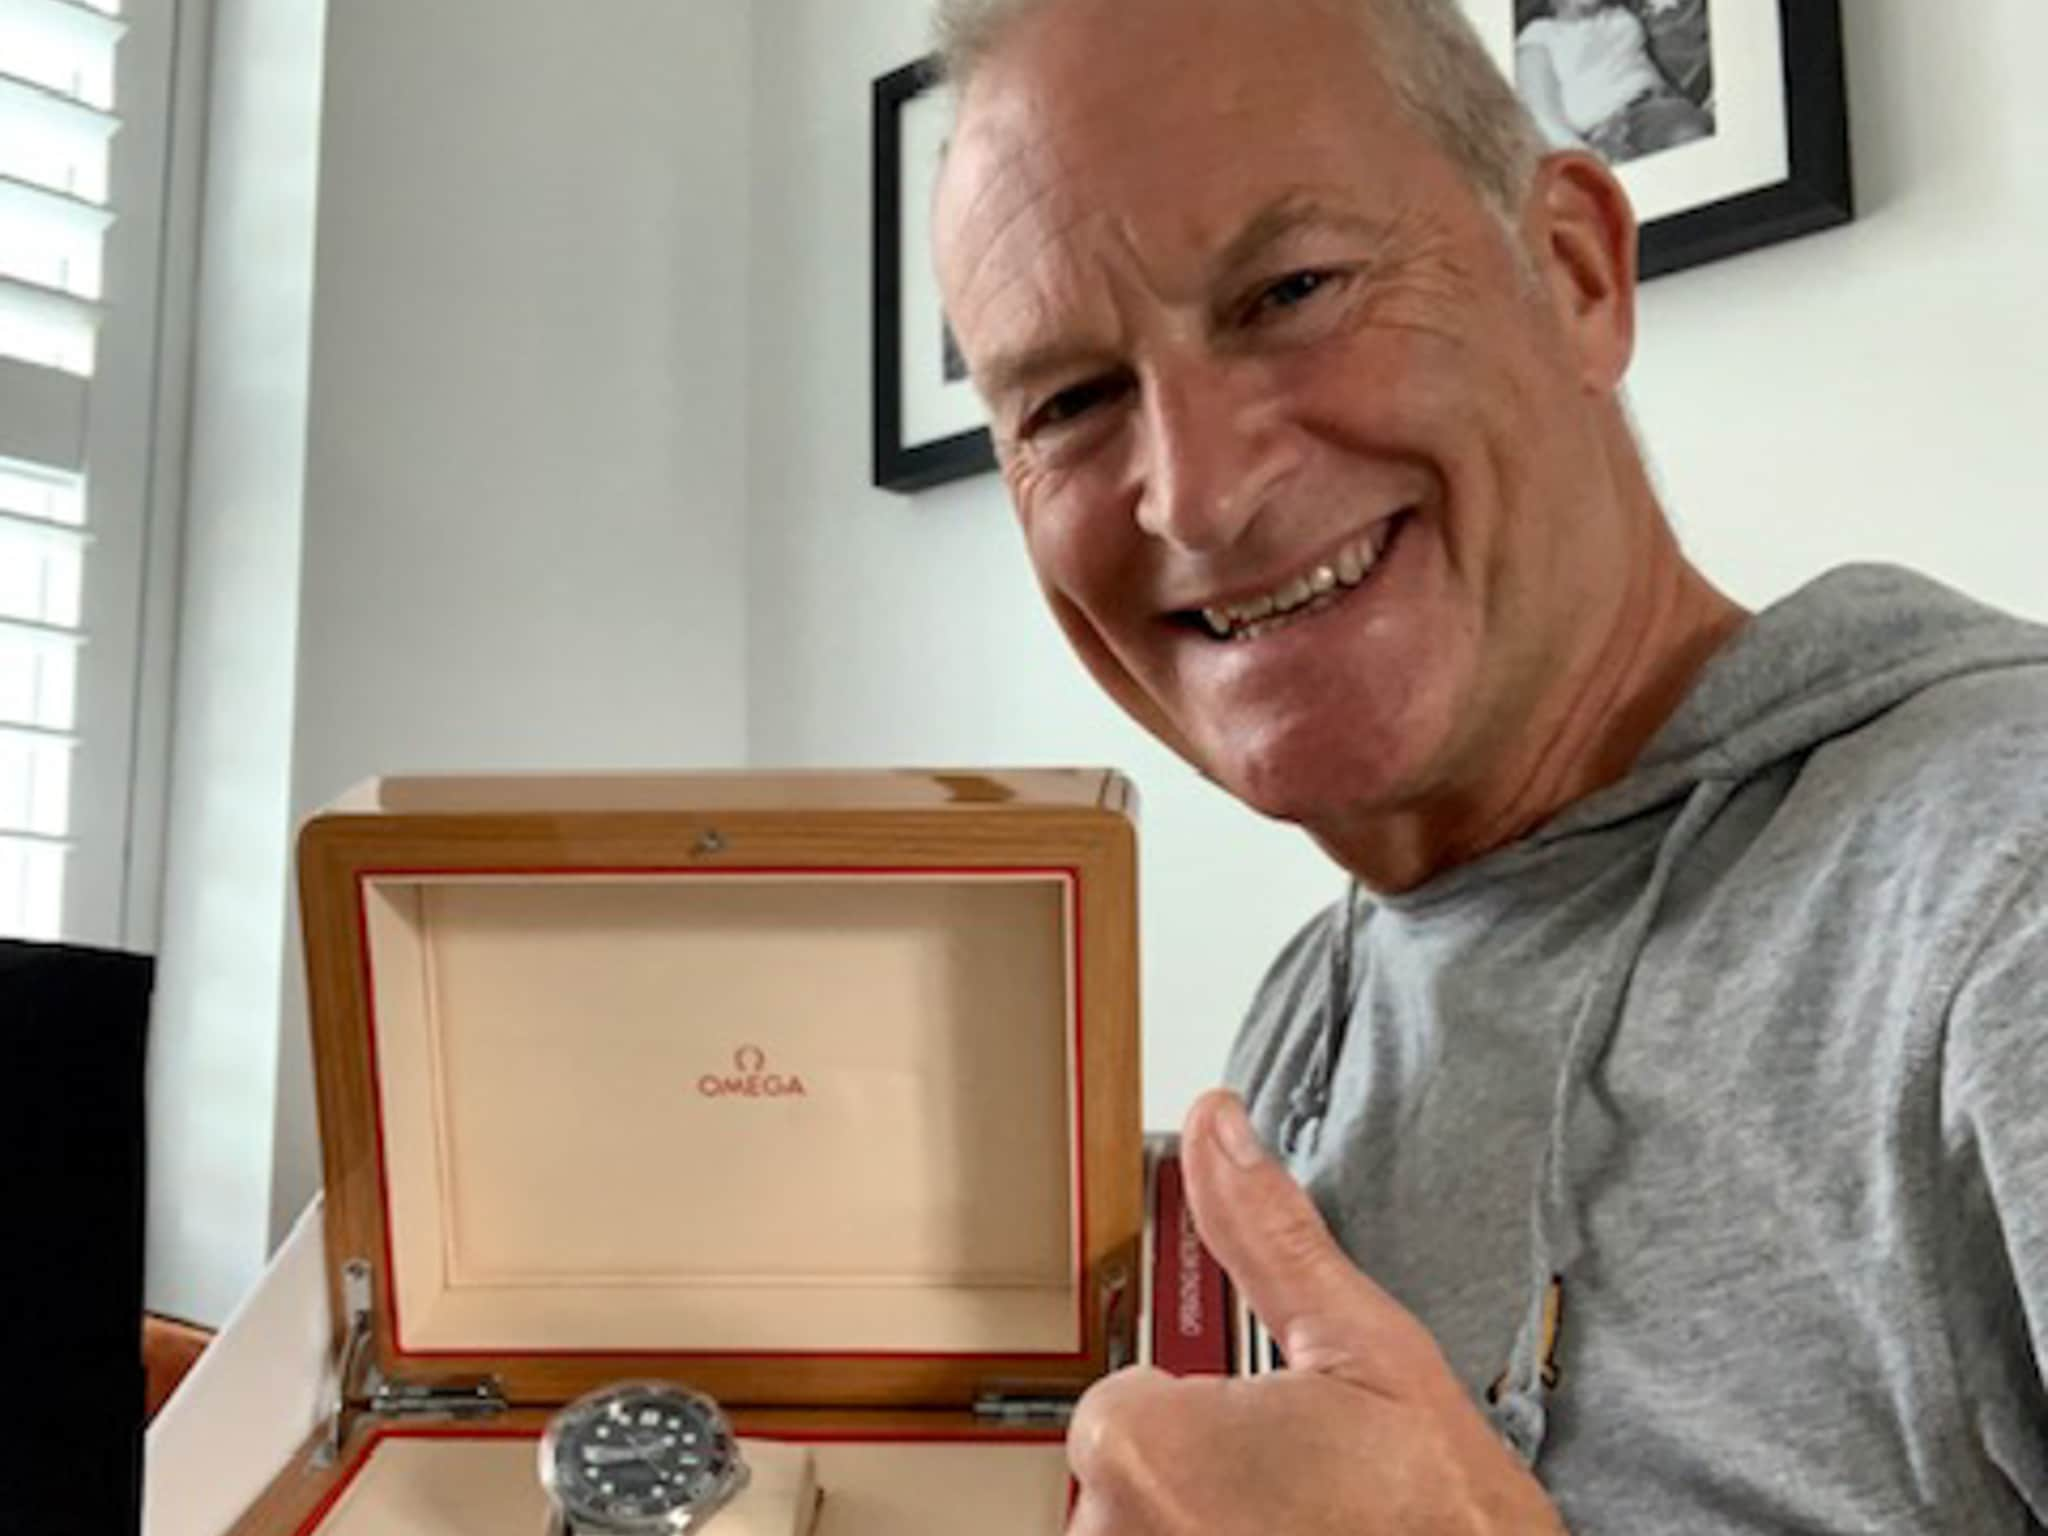 Winner Simon Lovatt of a OMEGA Seamaster Diver 300m Automatic Men's Watch - 28th June